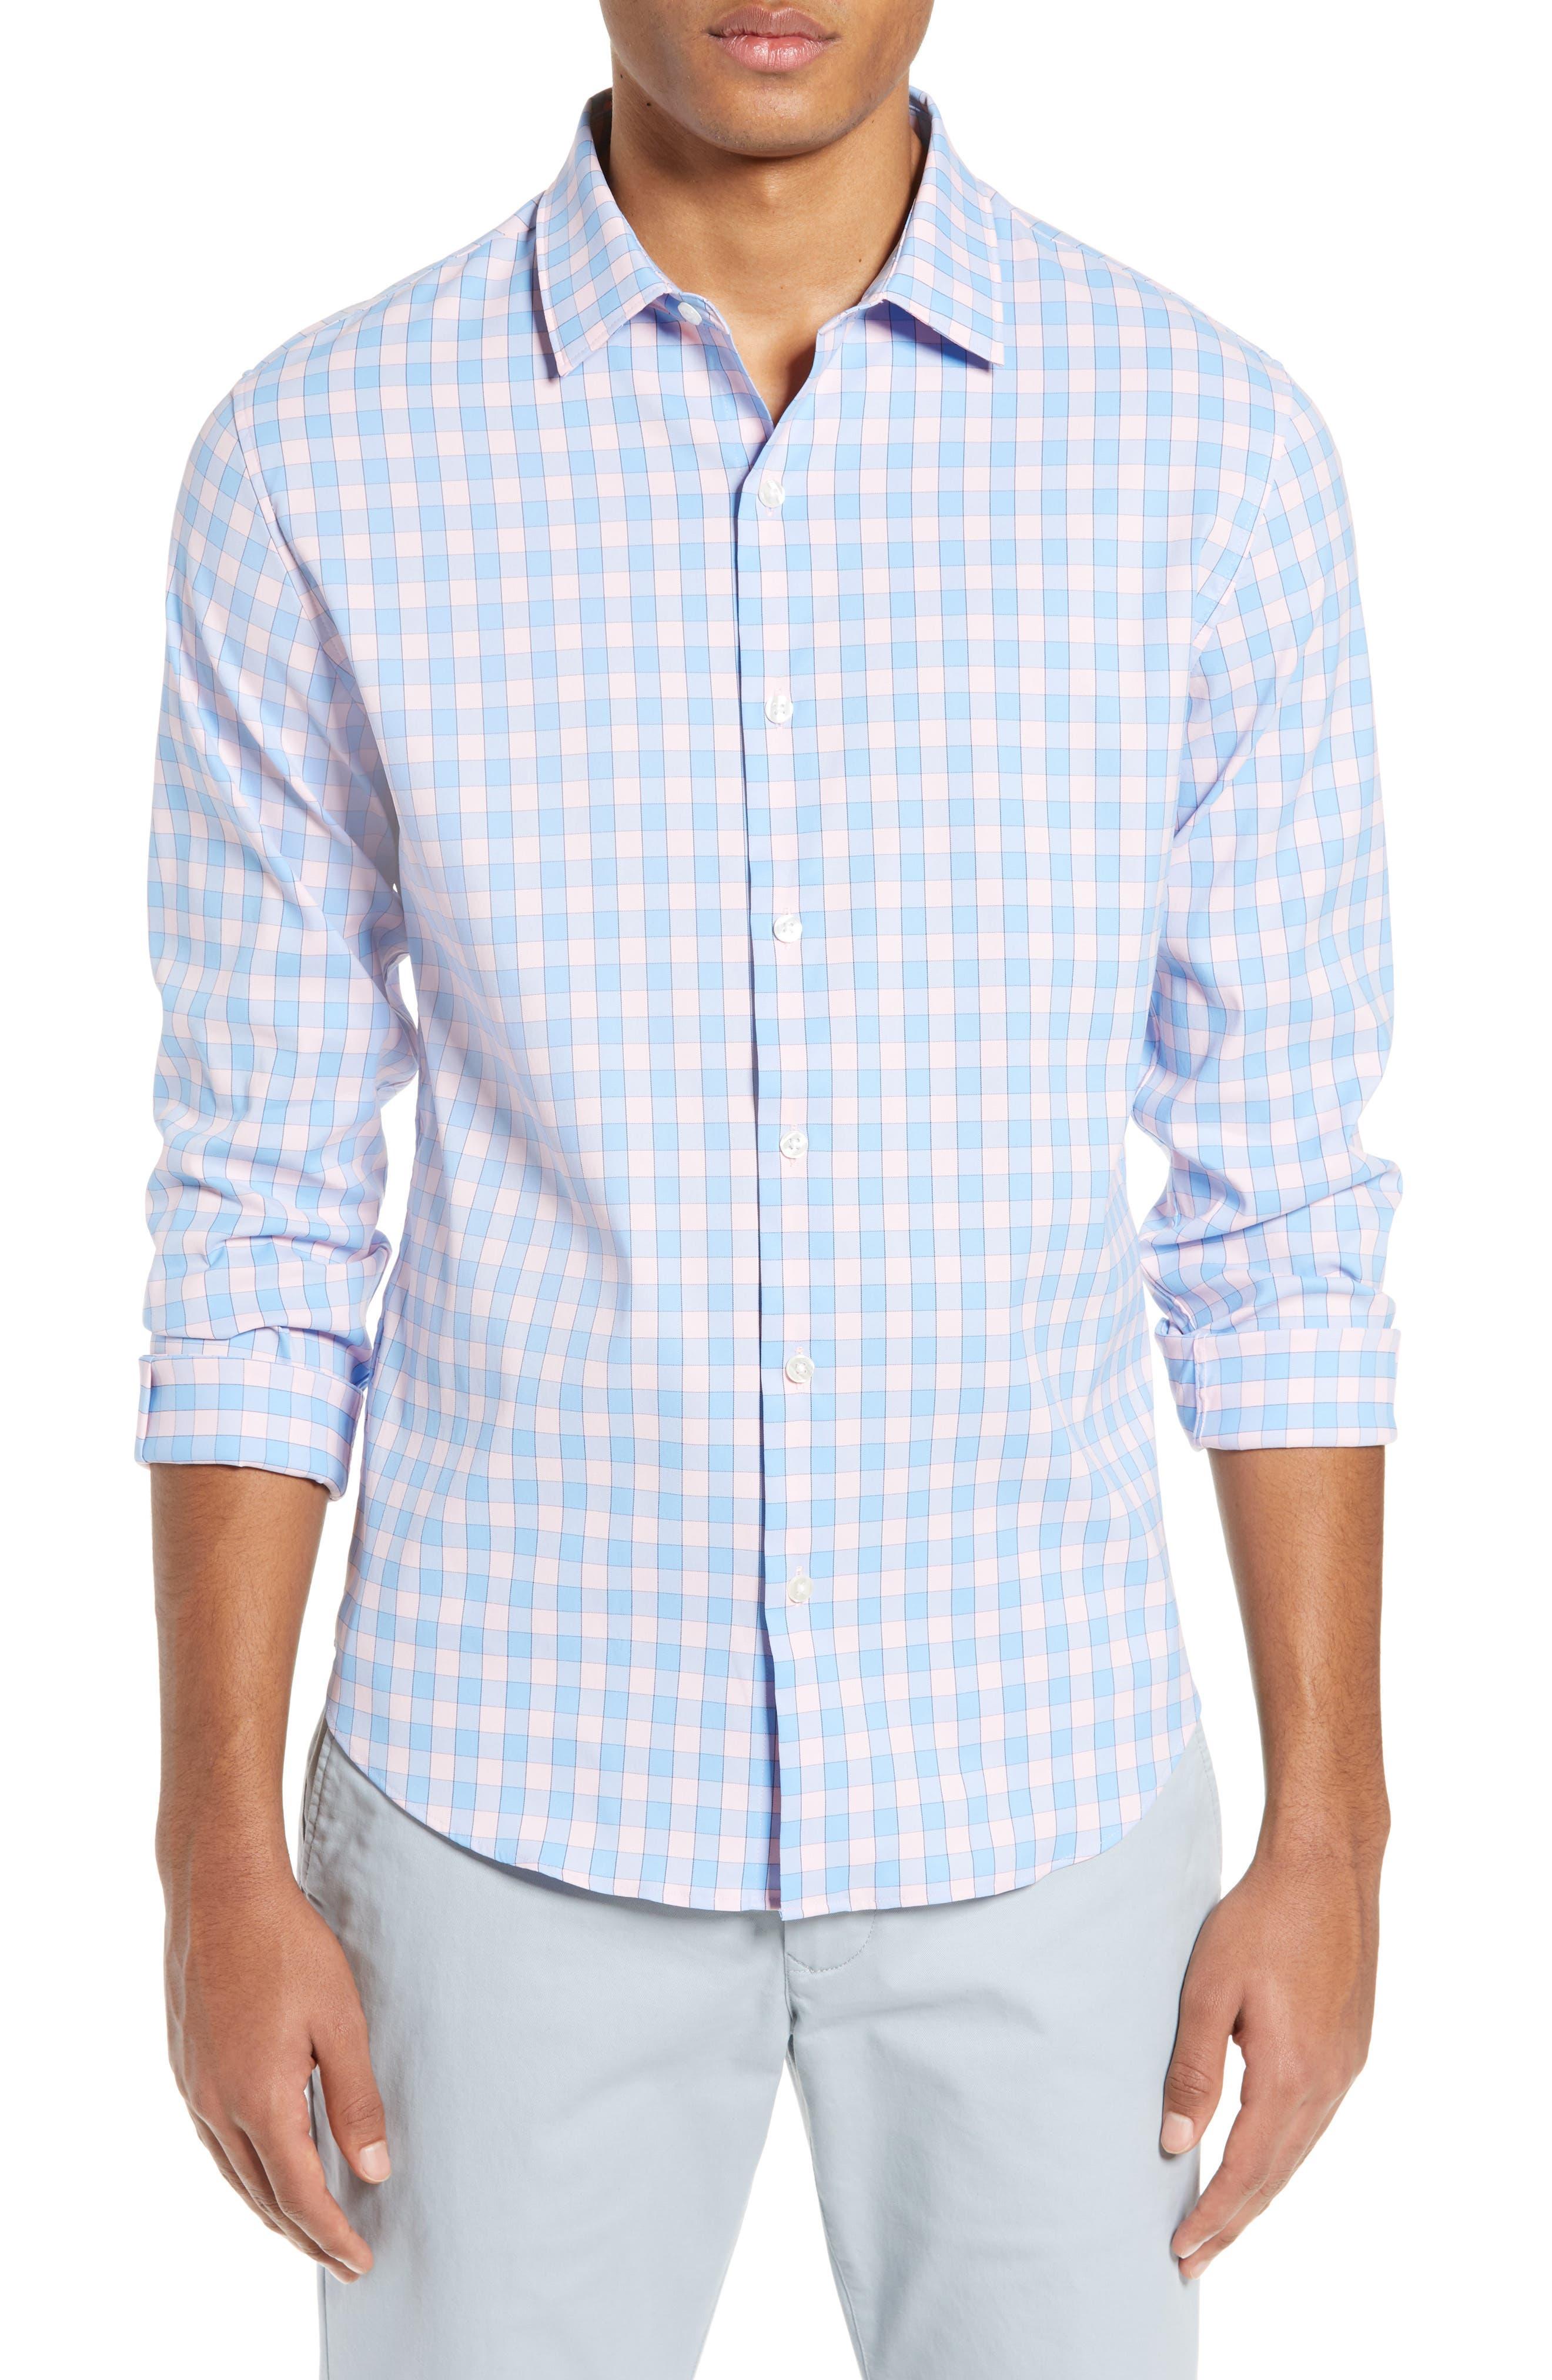 BONOBOS, Slim Fit Check Tech Sport Shirt, Main thumbnail 1, color, SAIL BOAT FIRST BLUSH